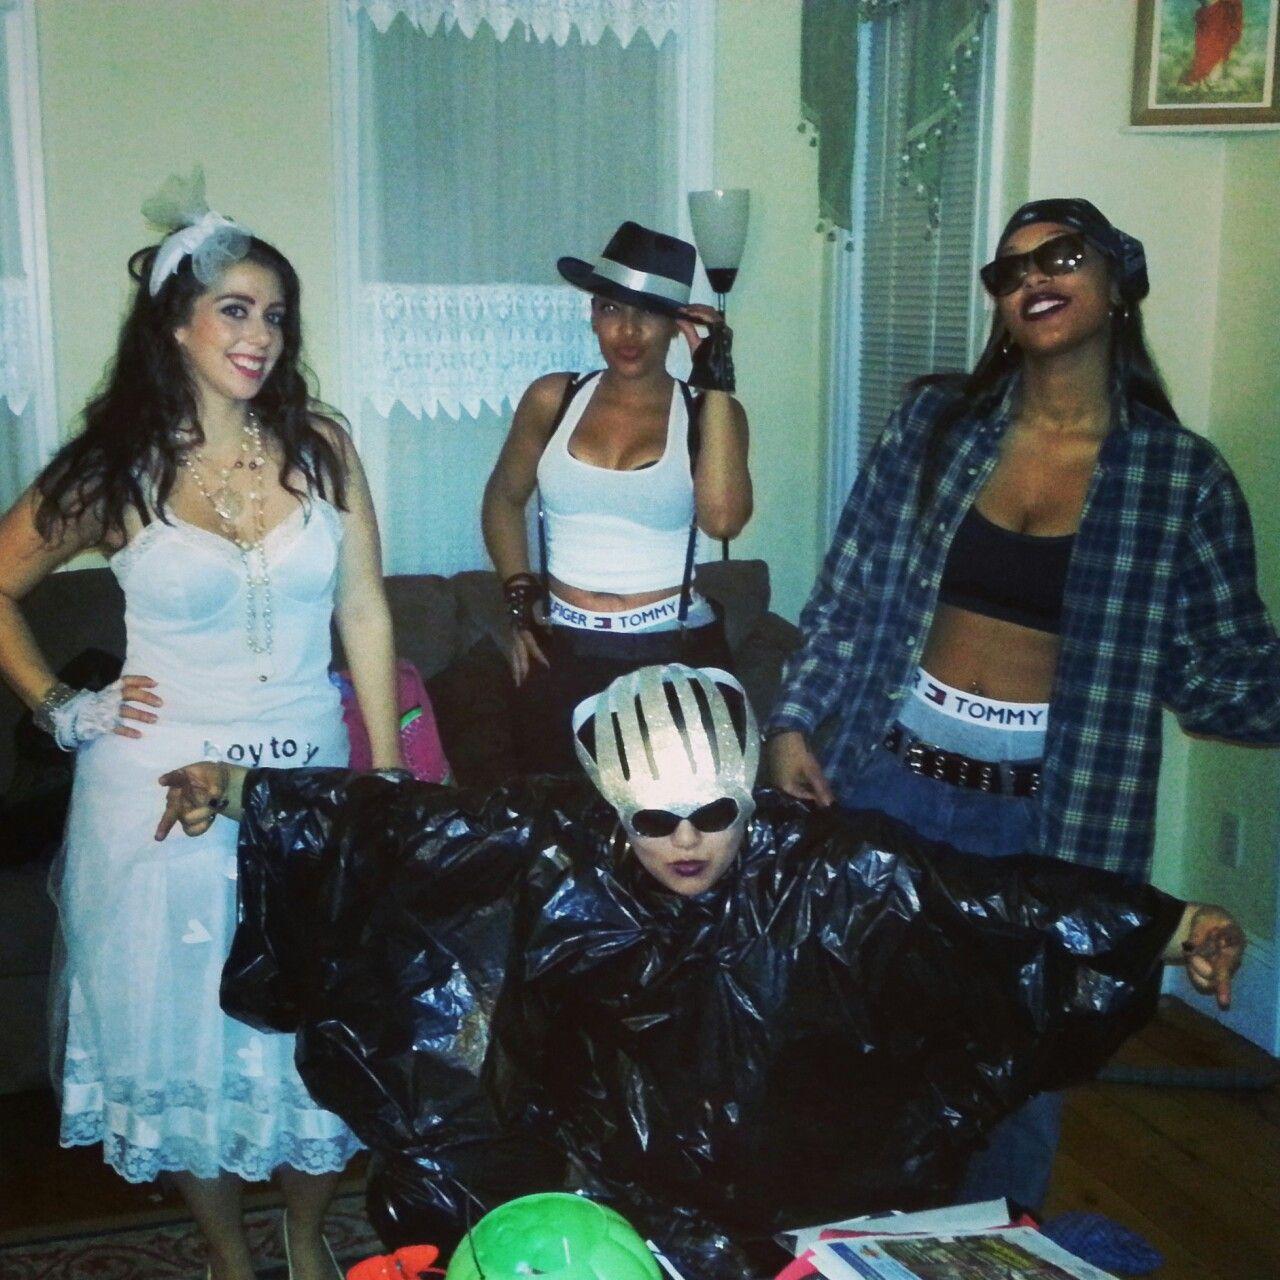 Madonna, Mya, Aaliyah, Missy Elliot in 2019 Missy elliot